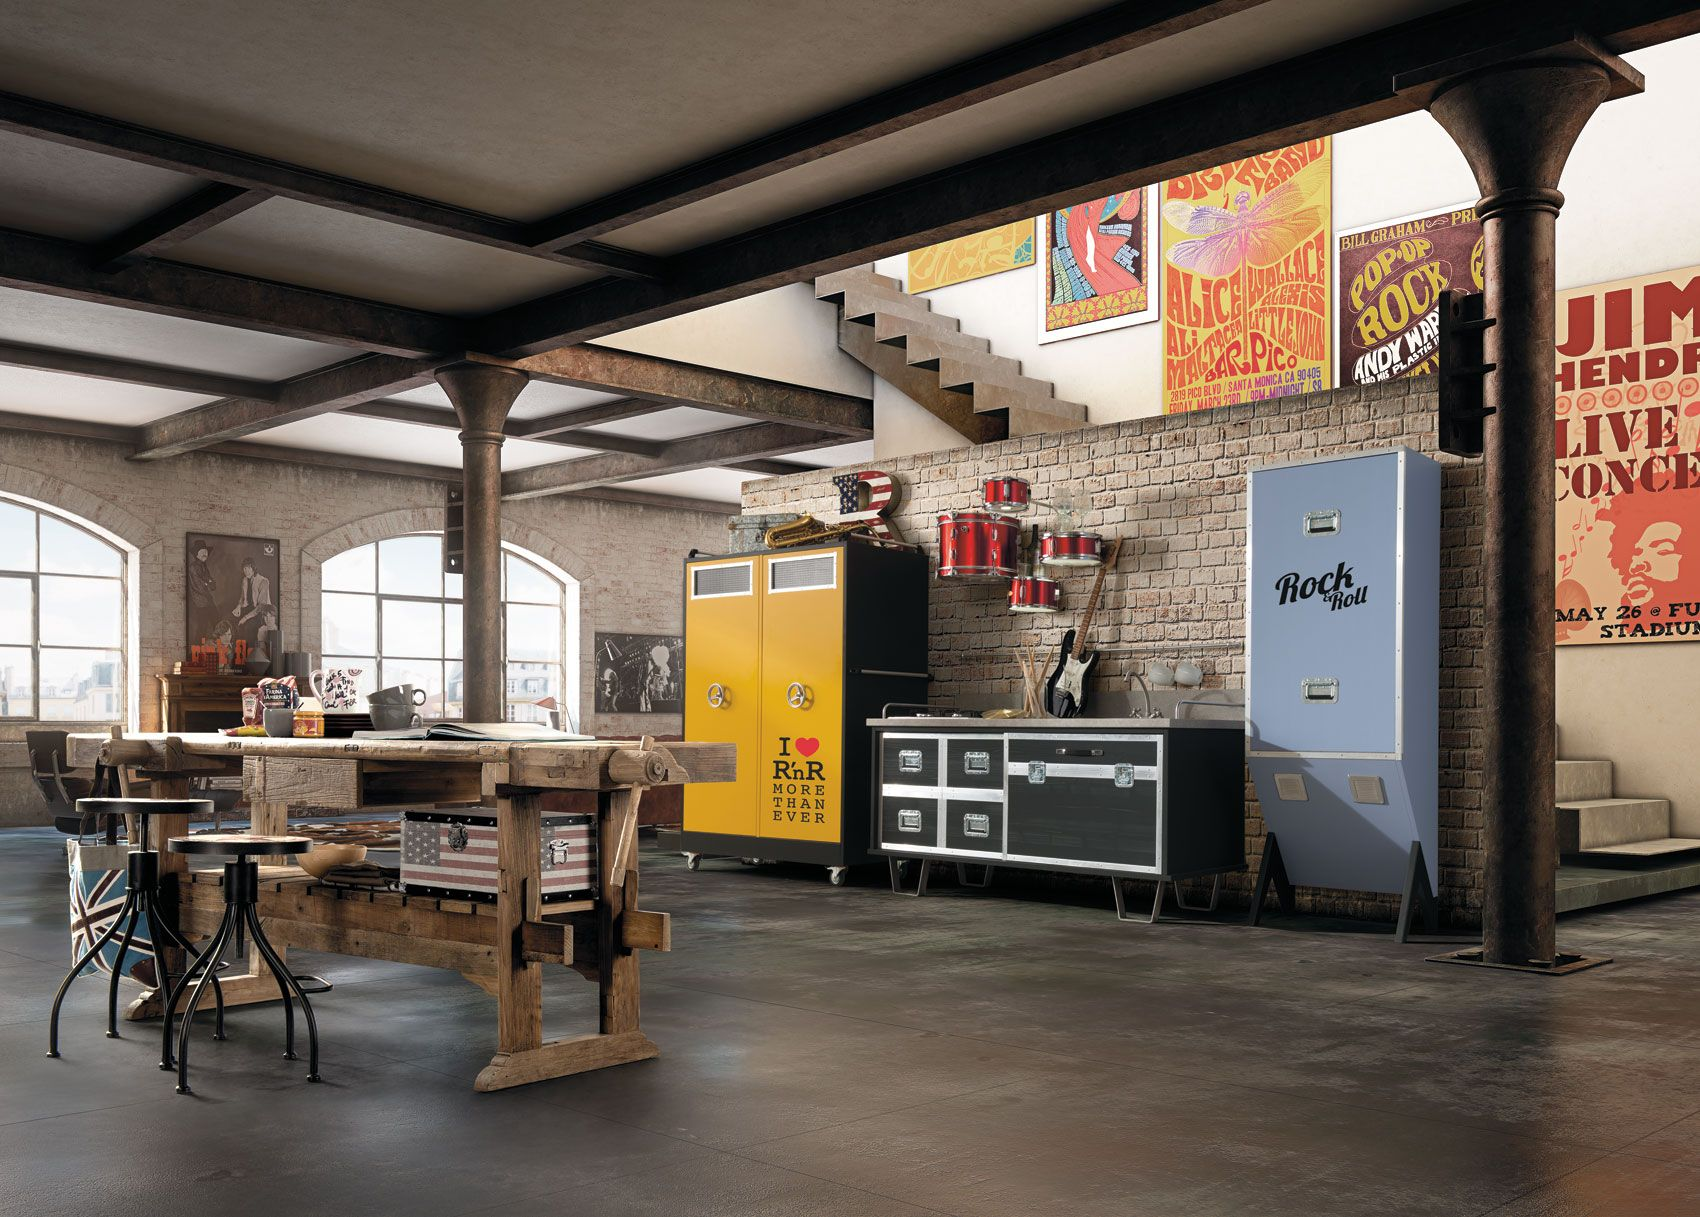 arredamento country, vintage, industrial, loft, urban, shabby chic